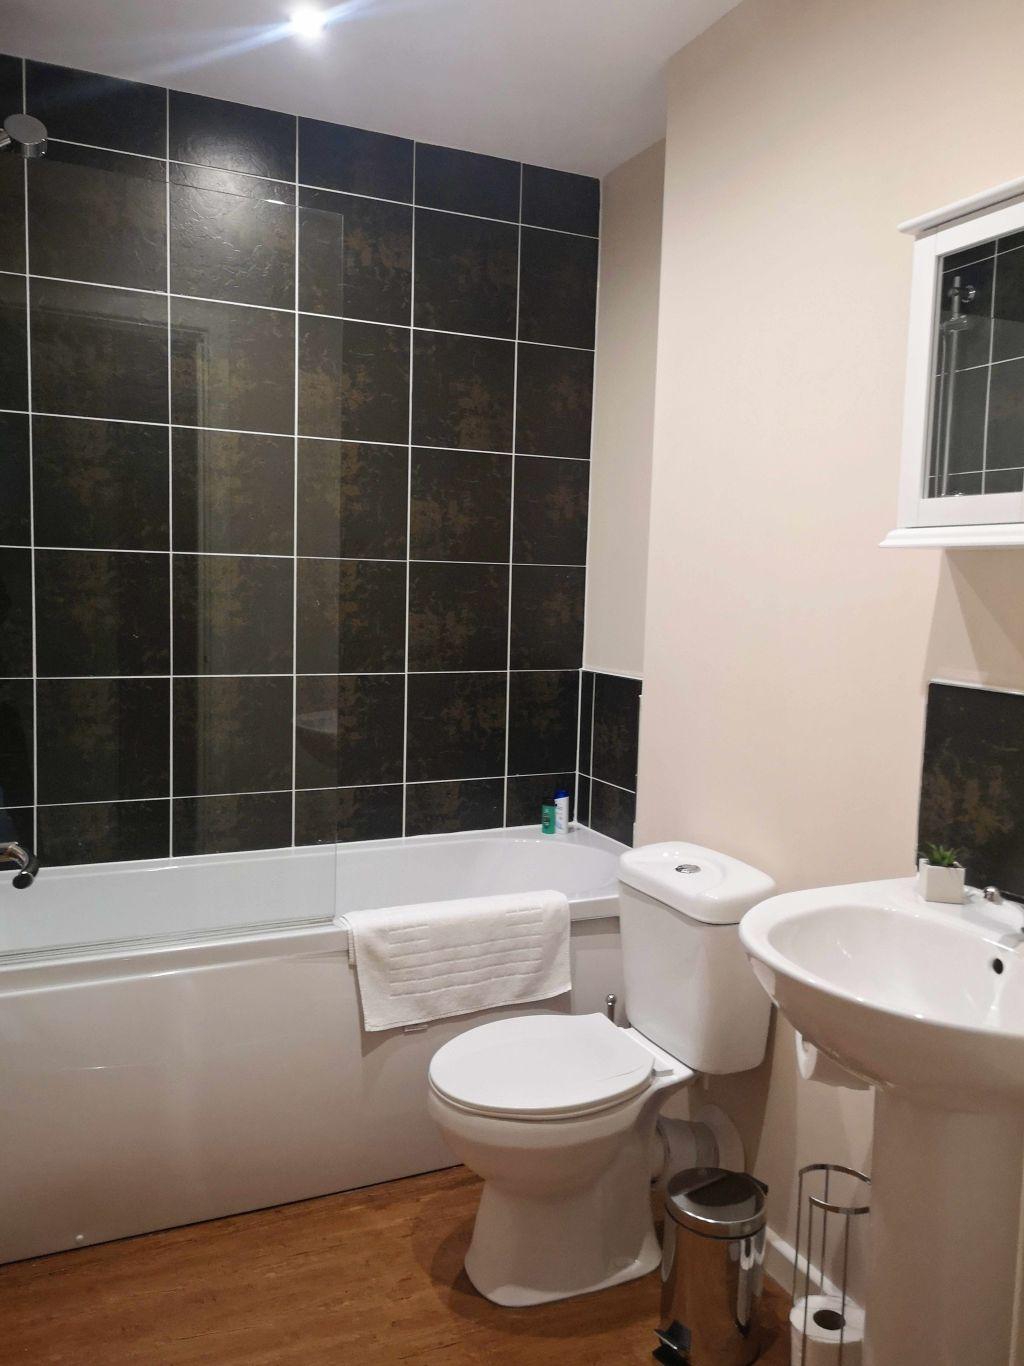 image 8 furnished 1 bedroom Apartment for rent in Longford, Hillingdon